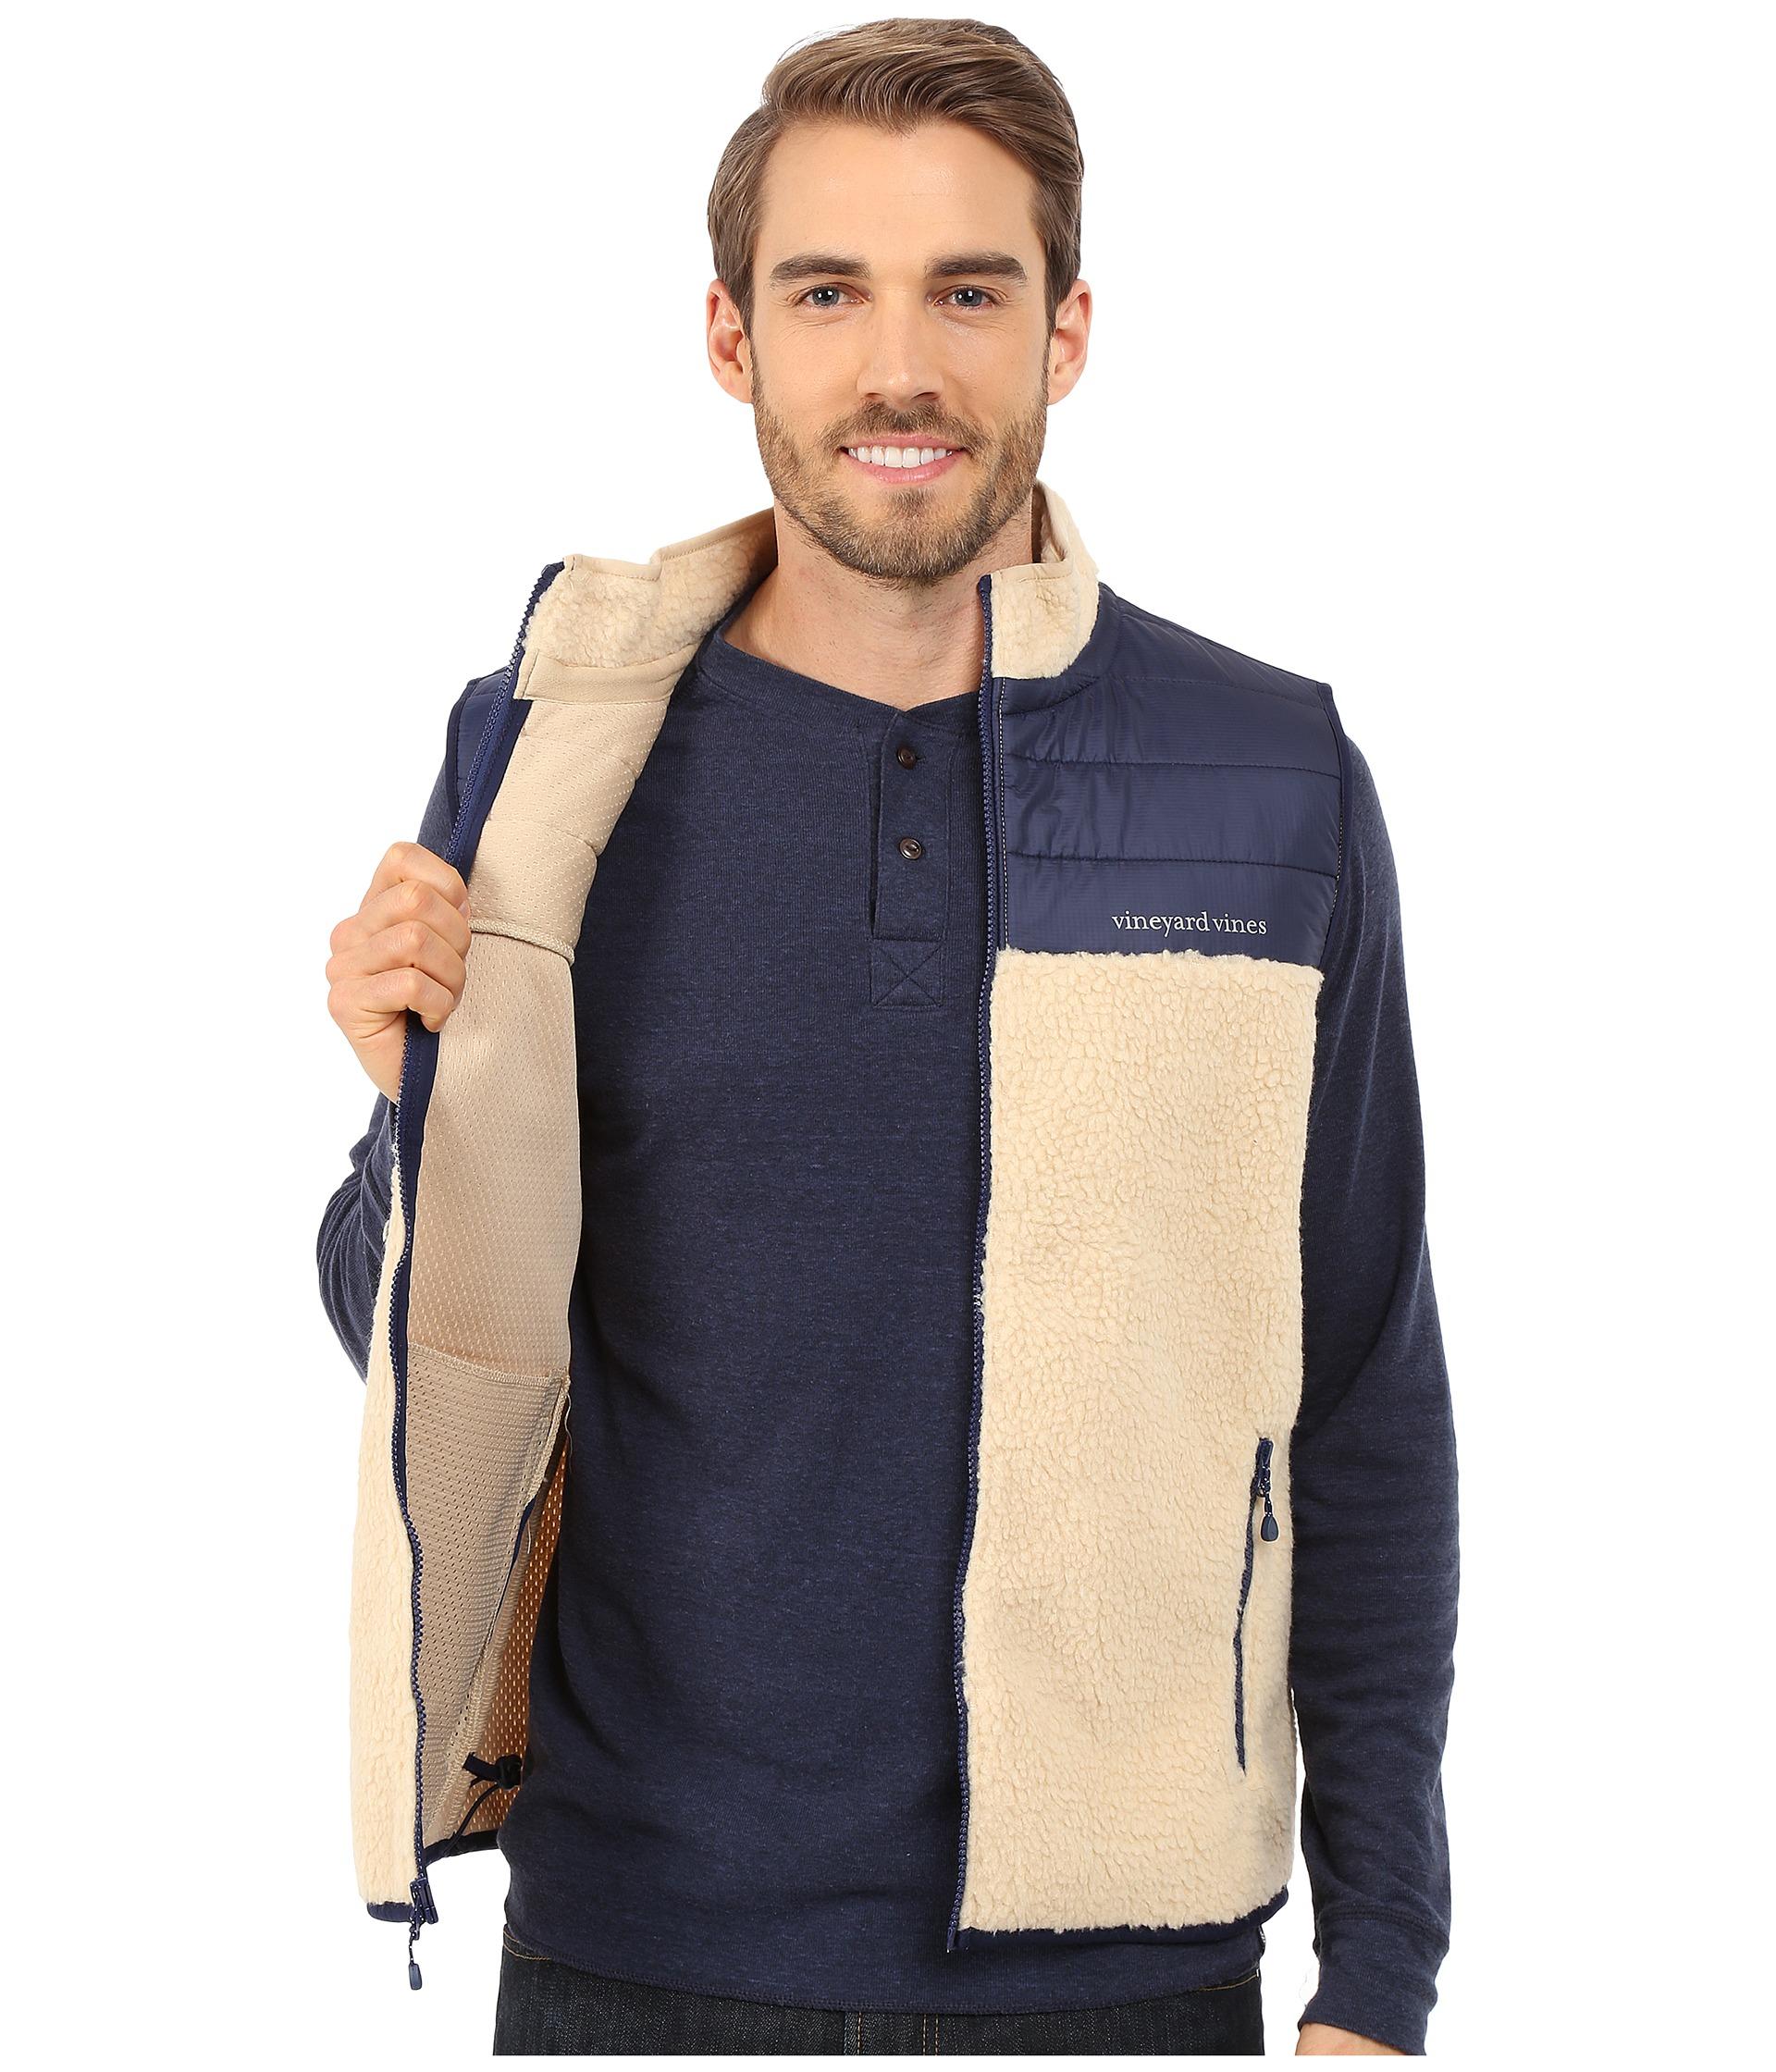 Vineyard vines Sherpa Full Zip Vest in Blue for Men   Lyst